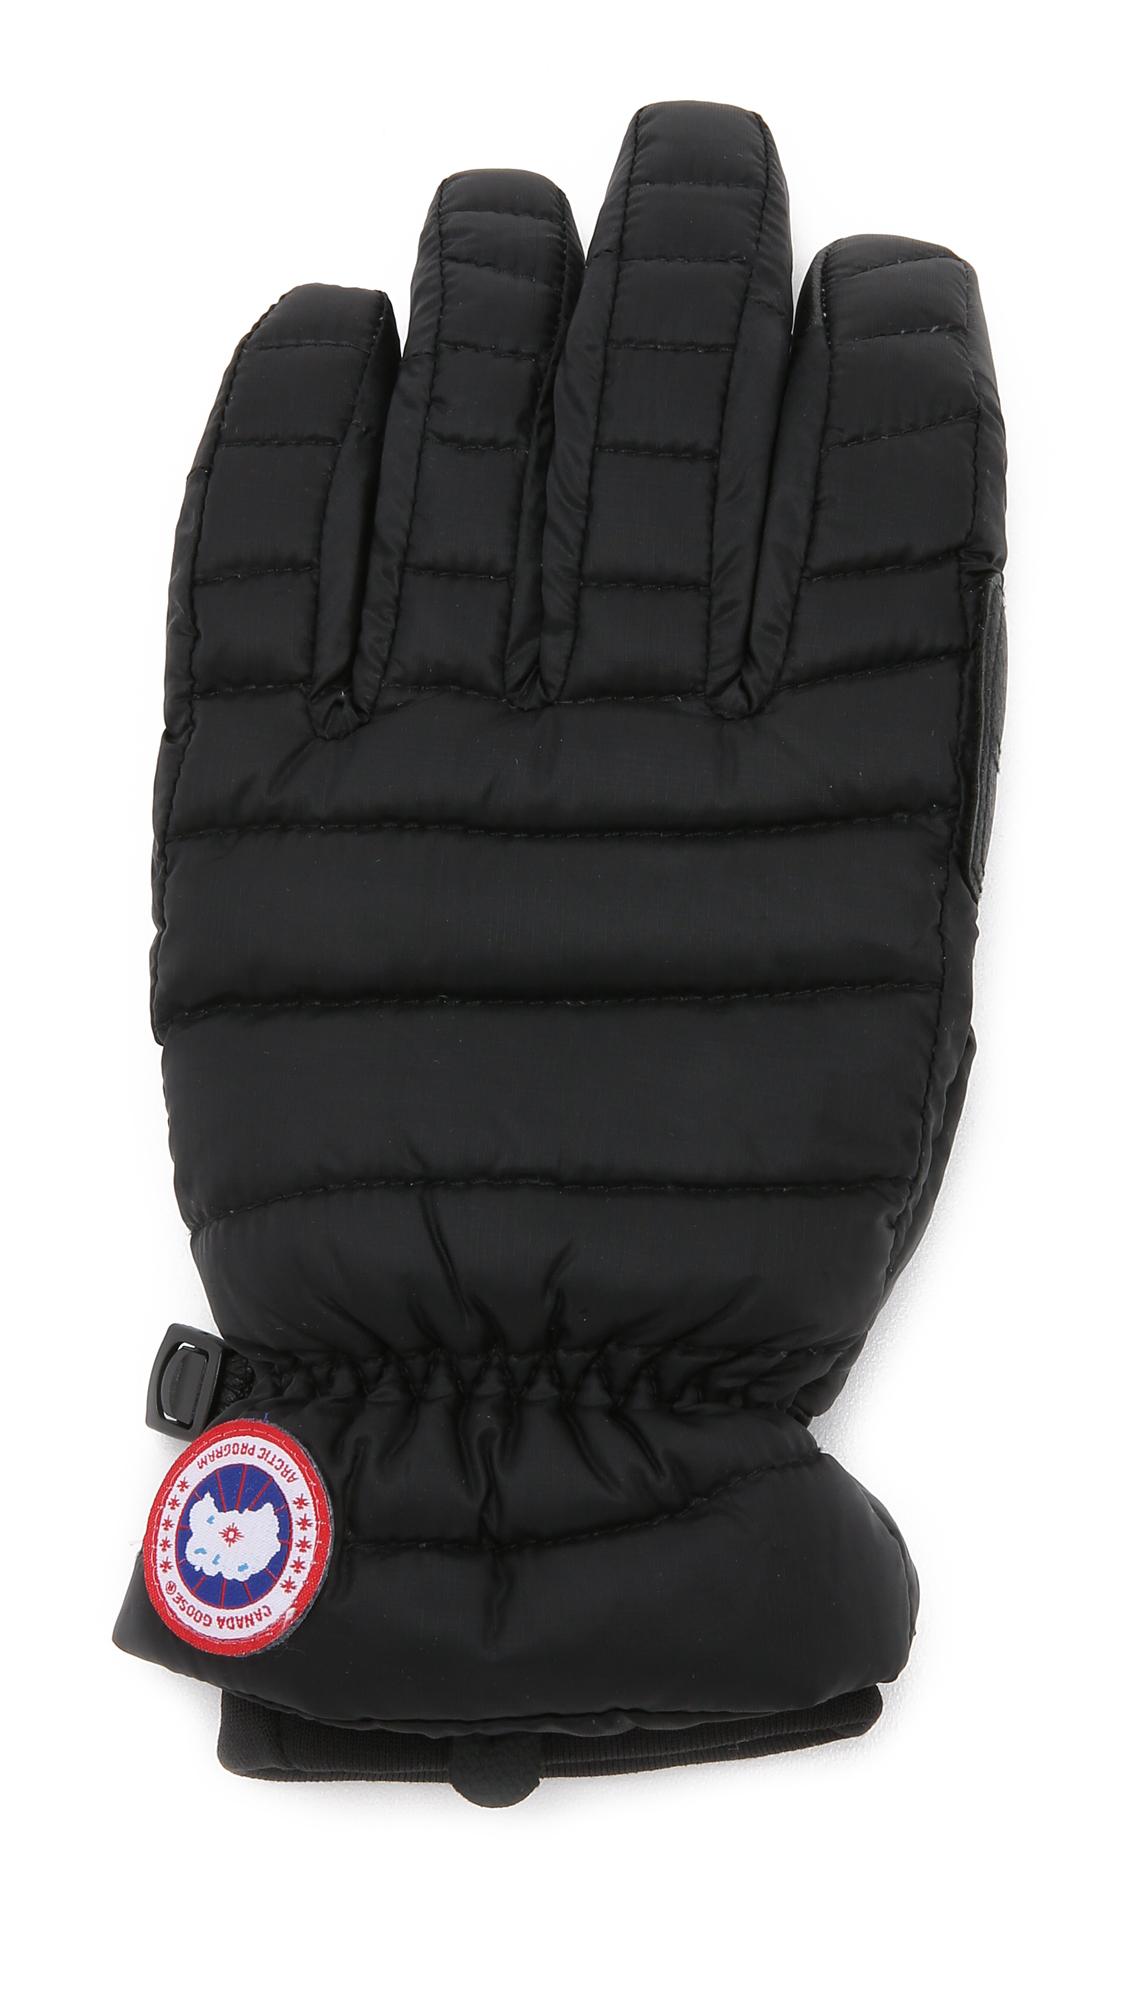 ba110cba17f2 Canada Goose Lightweight Gloves Womens